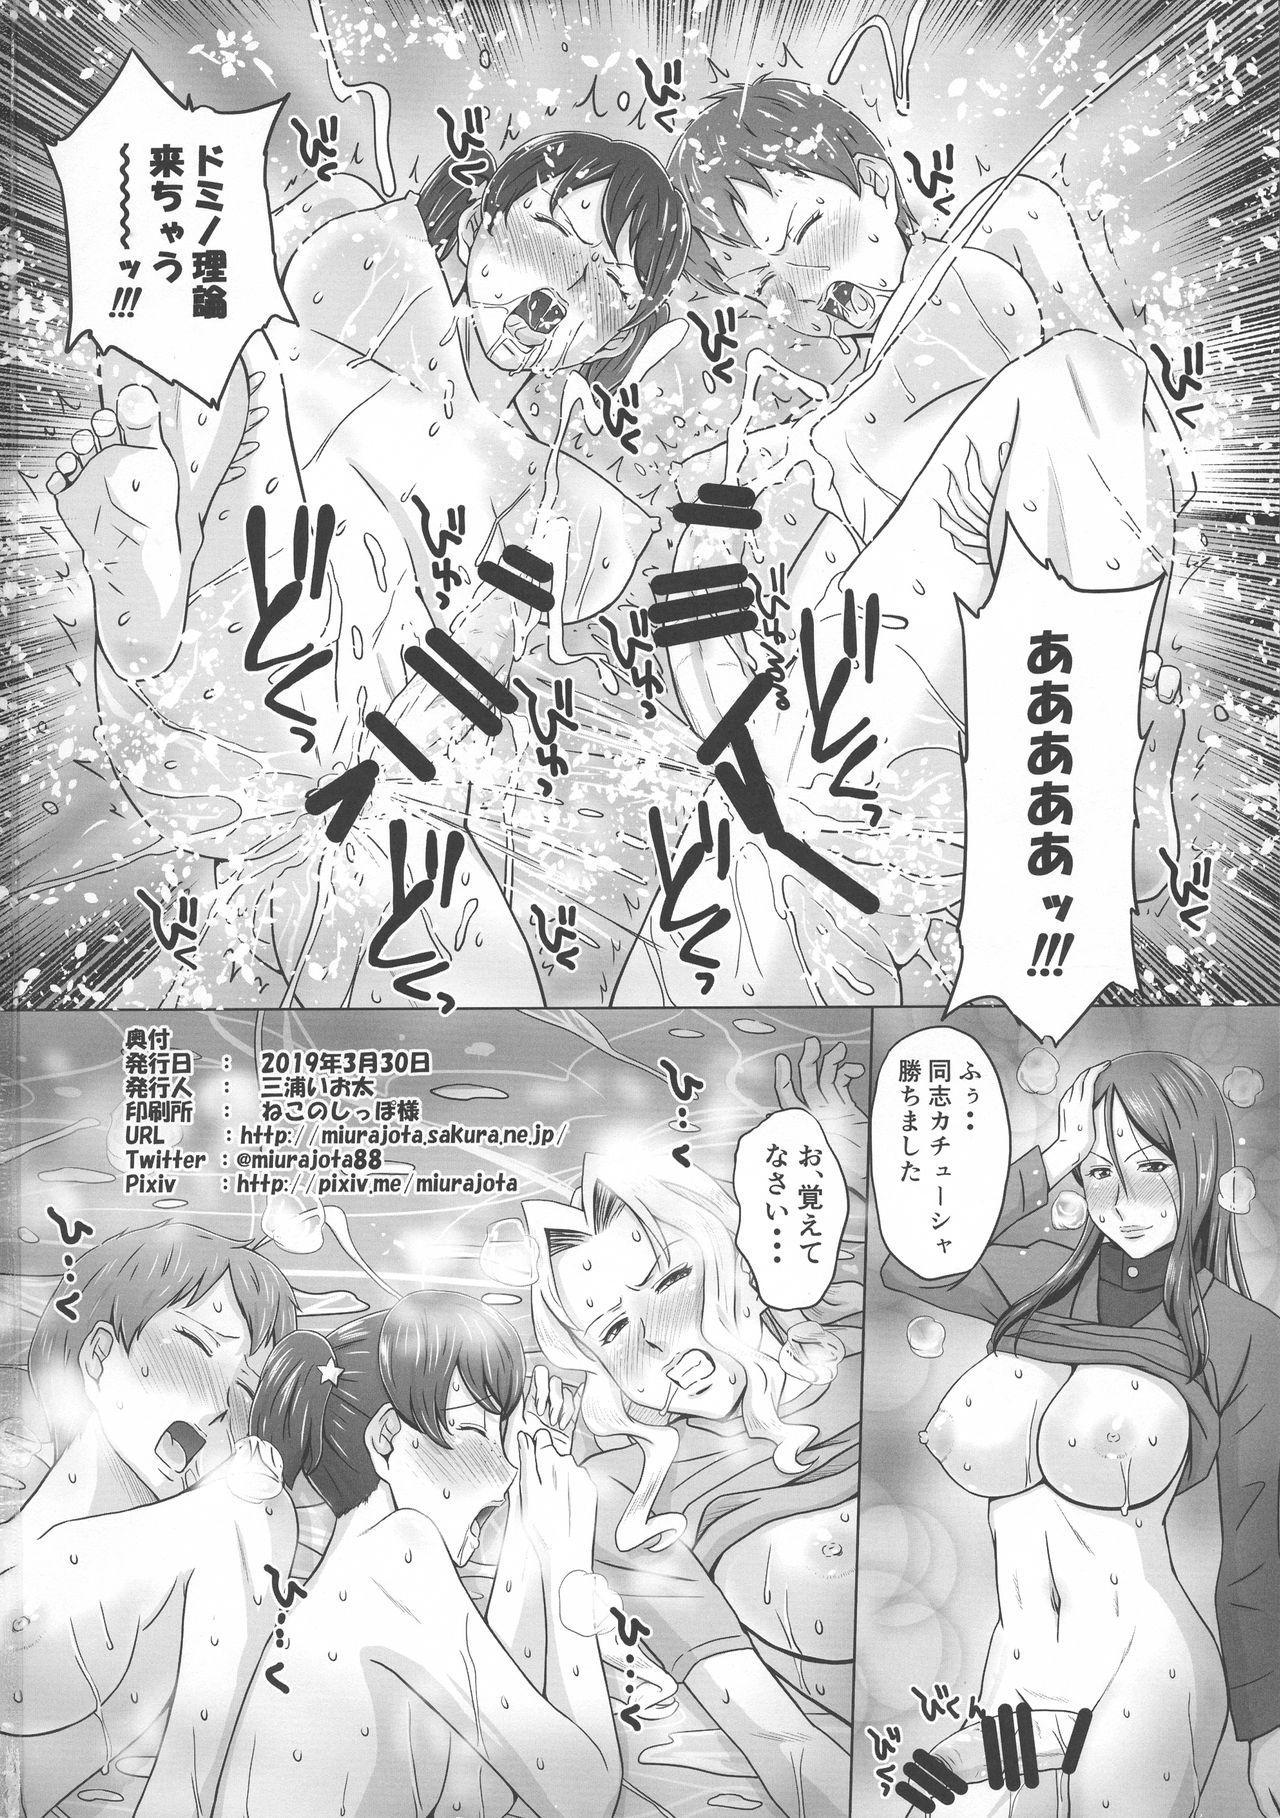 Ura Senshamichi Futanari Les Battle! Vol. 1 17